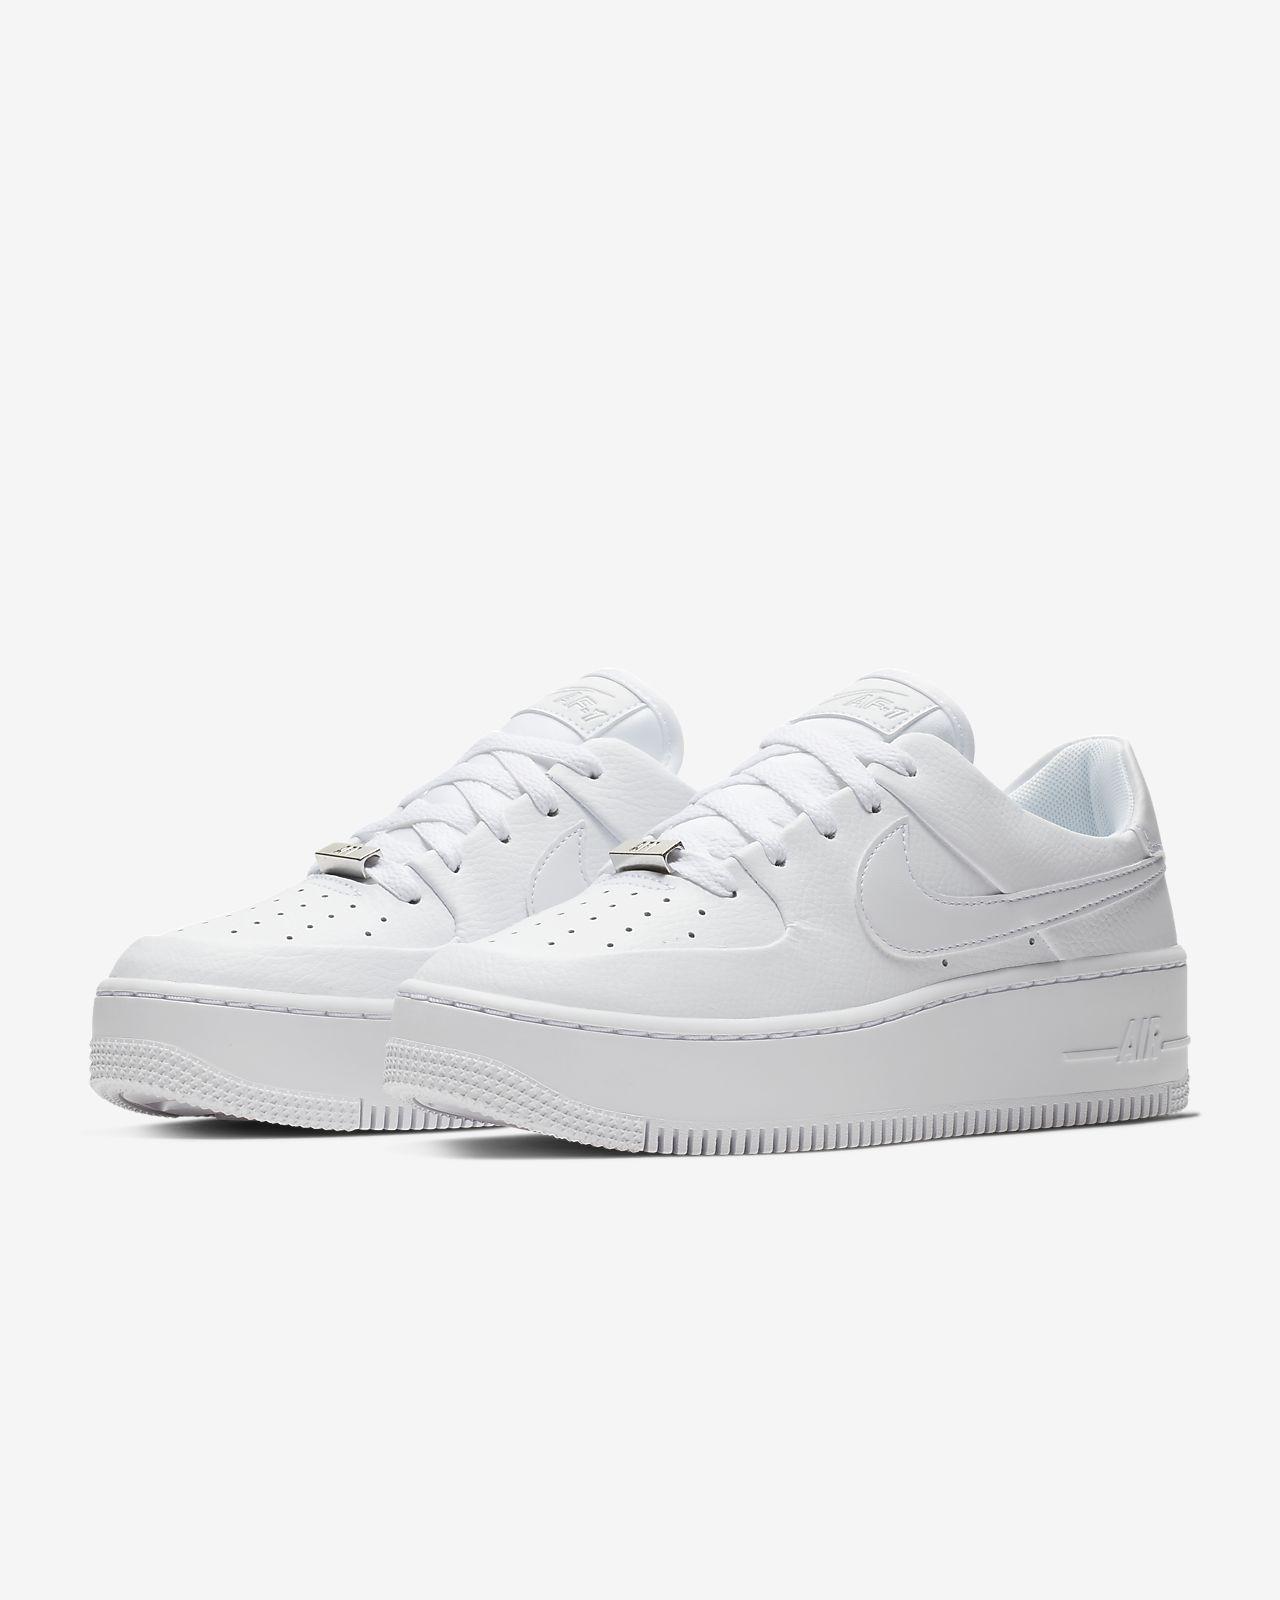 Sapatilhas Nike Air Force 1 Sage Low para mulher